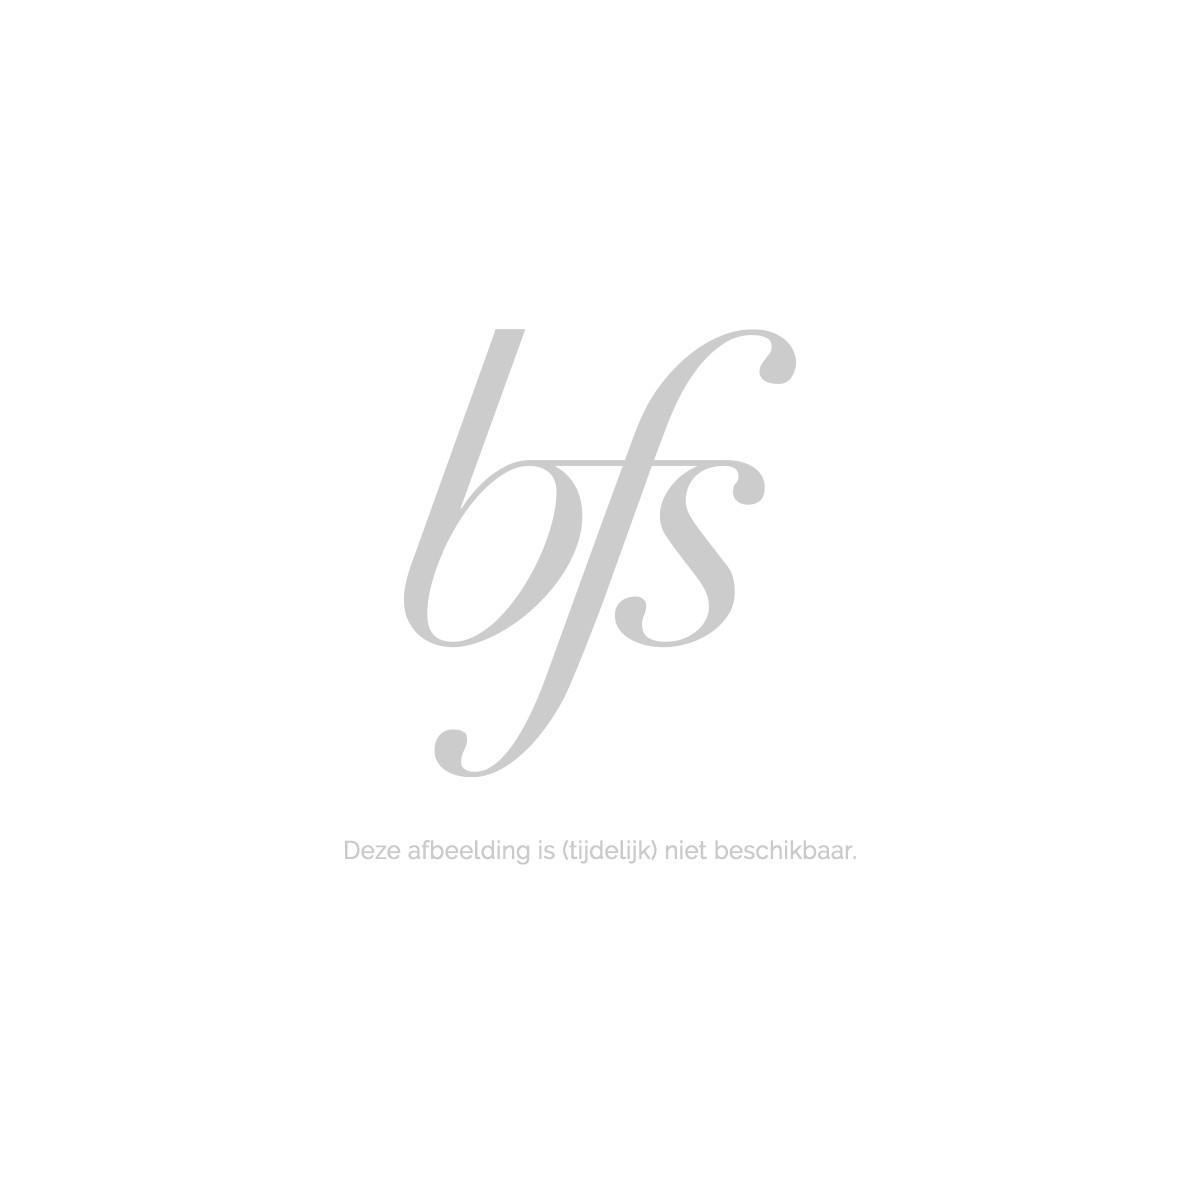 Laura Mercier Smooth Finish Foundation Powder #20 All Skin Types 9,20 gr